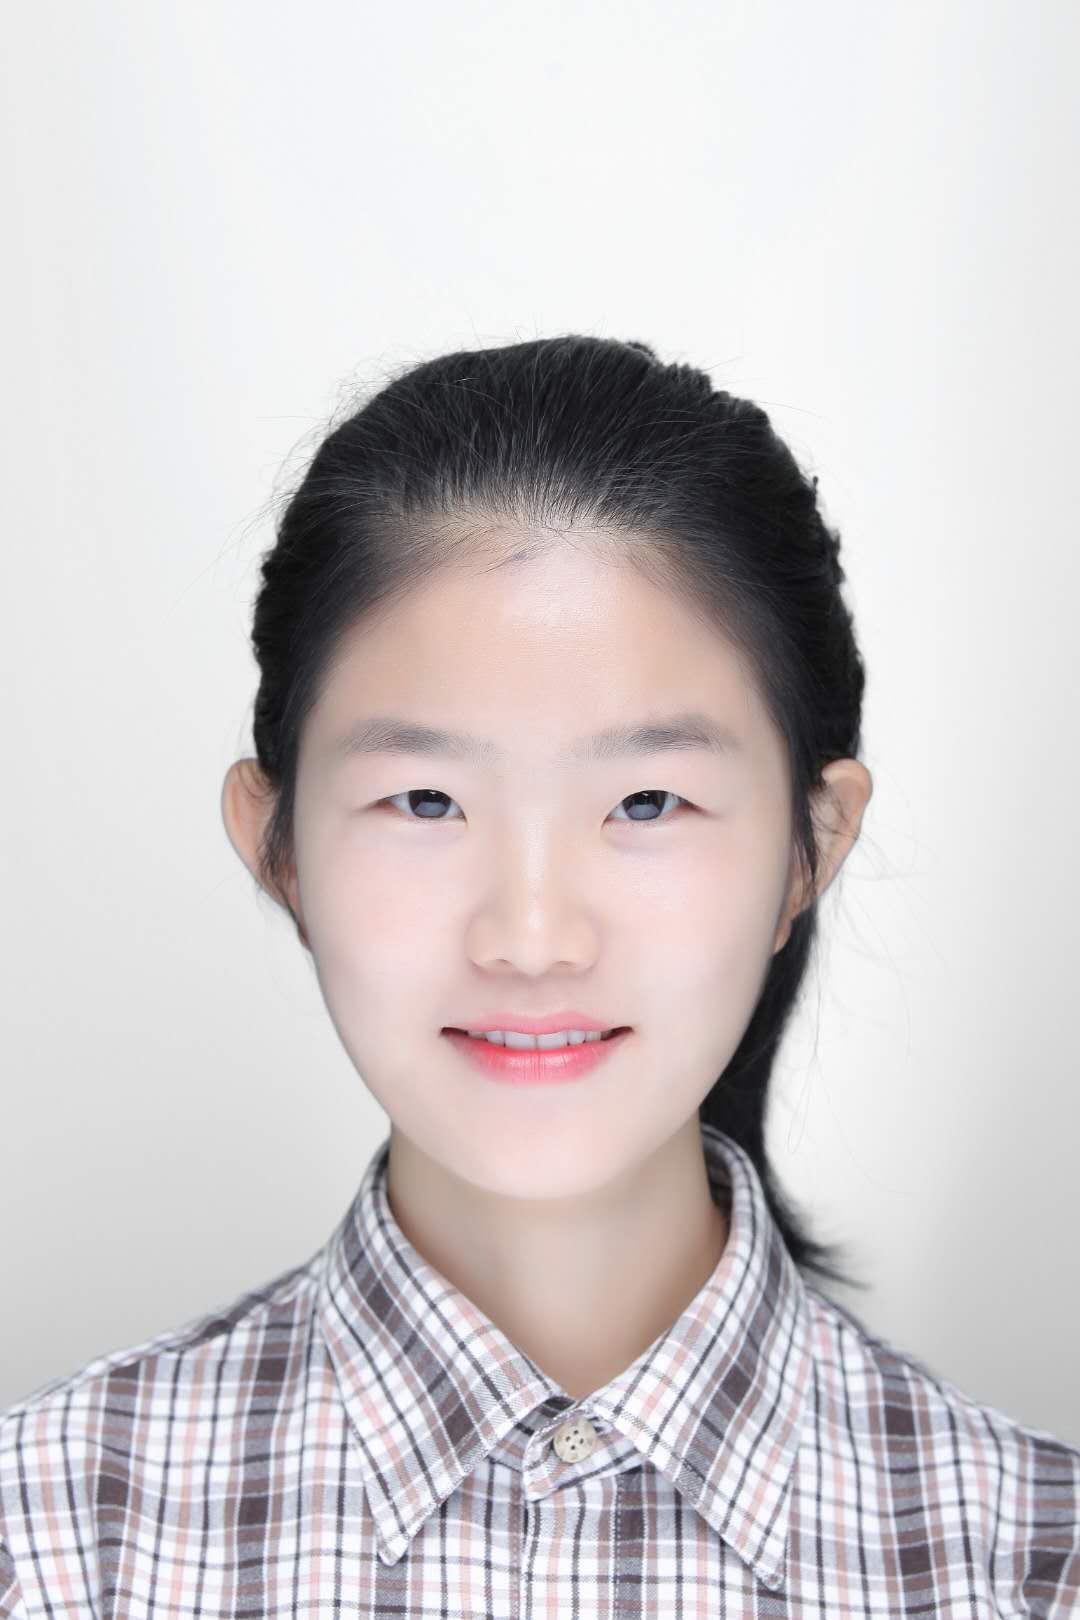 Li Song